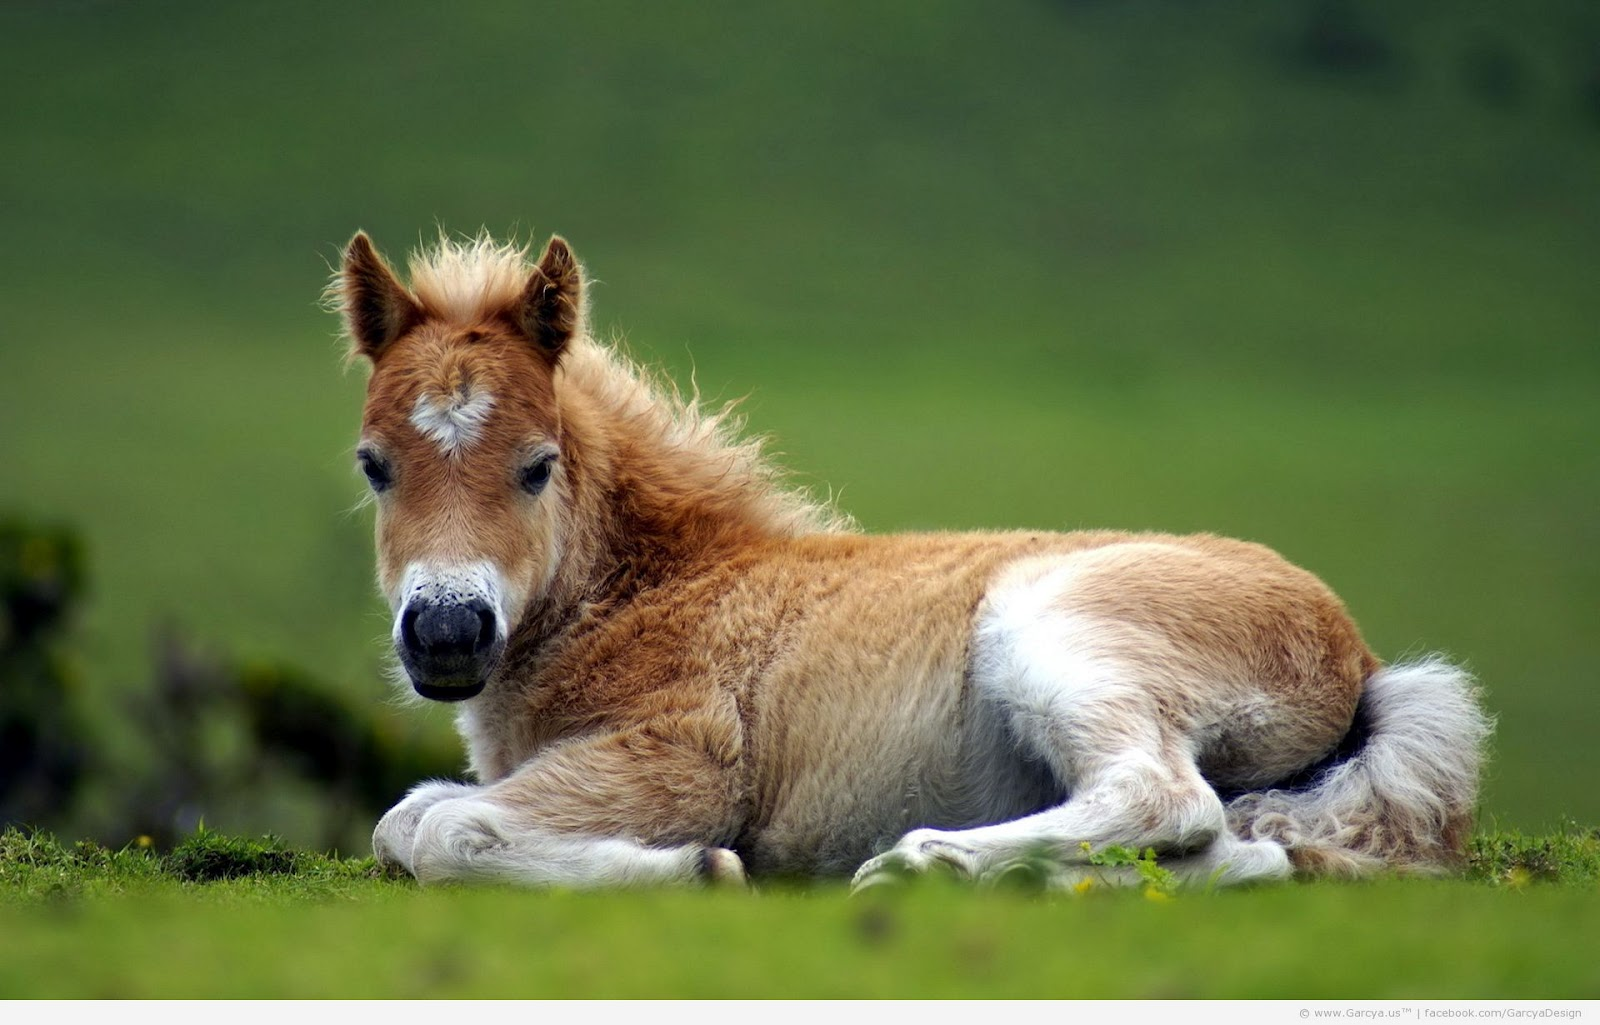 Gambar Anak Kuda Unik Aneh Lucu Dan Imut Banget Kumpulan